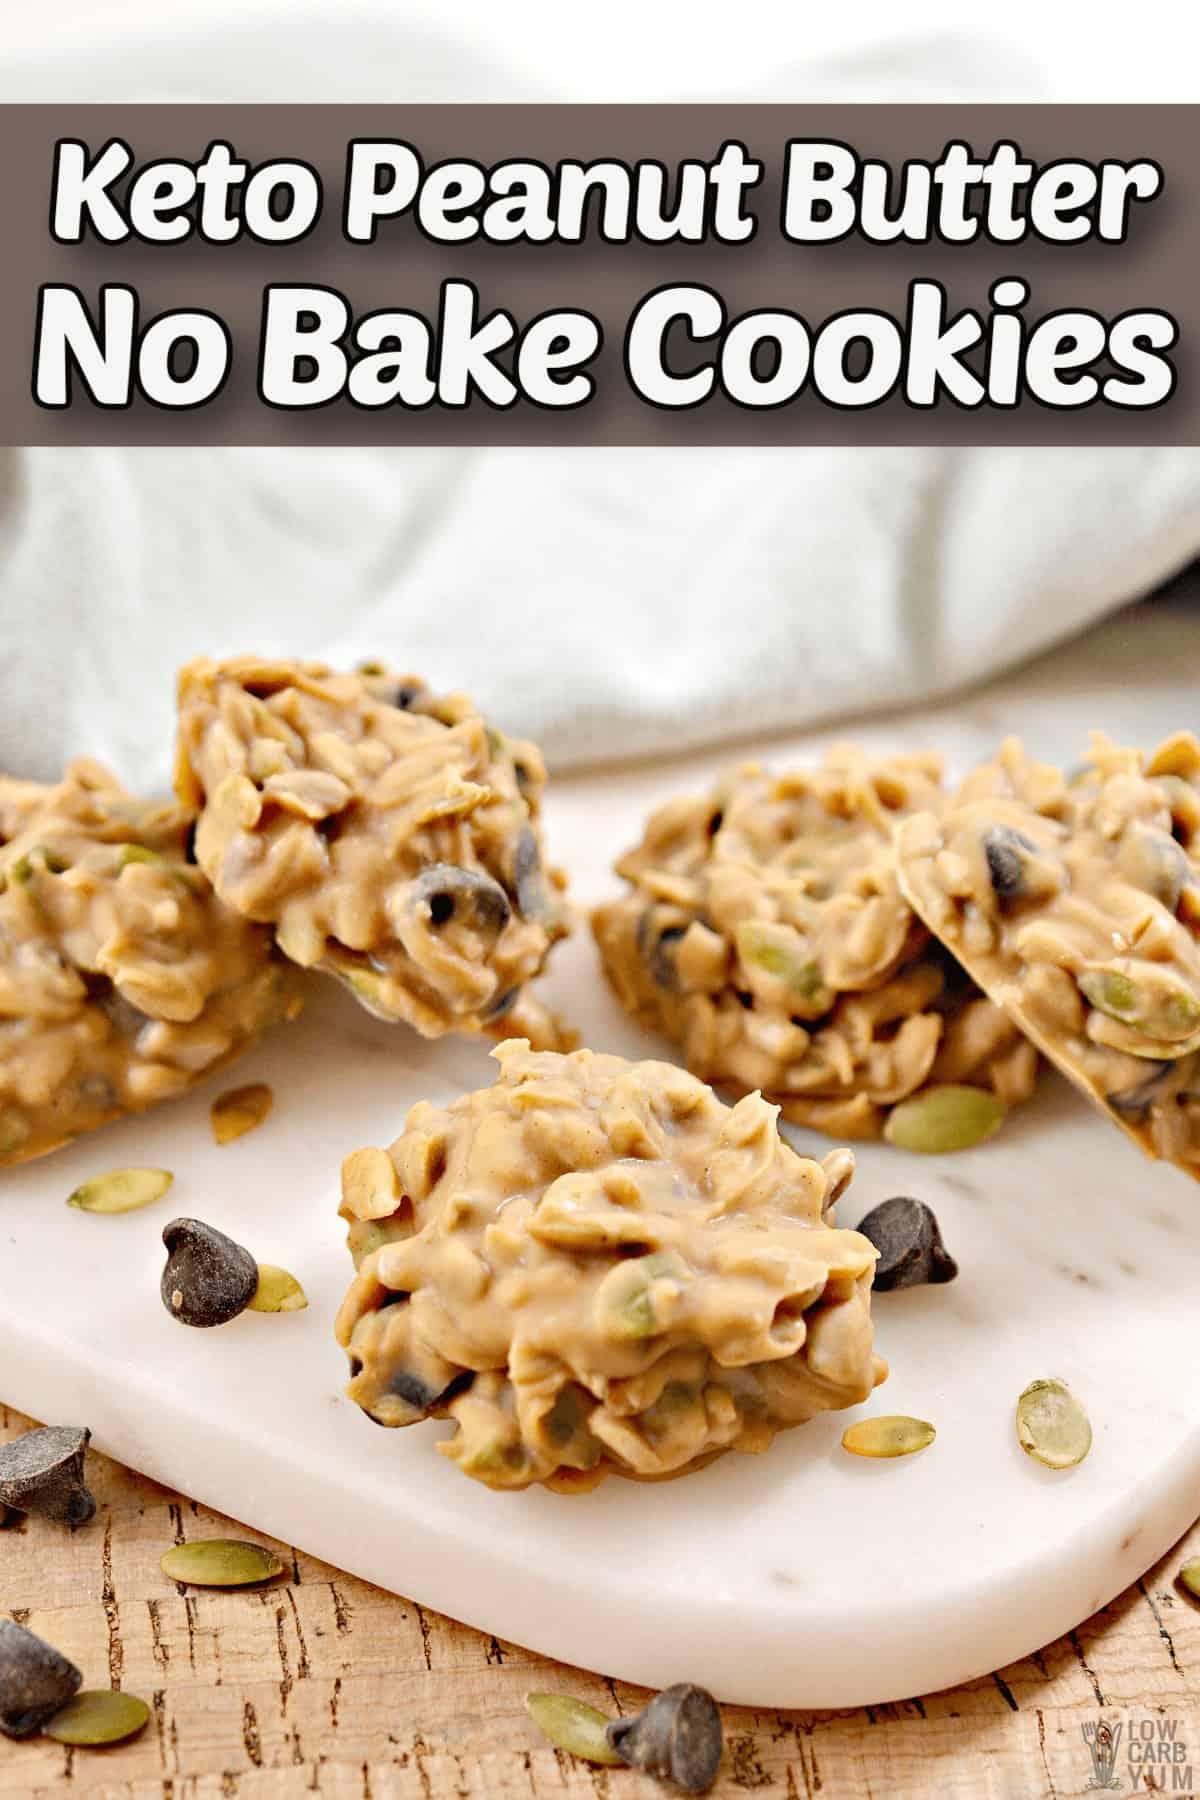 peanut butter no bake cookies pintrest image